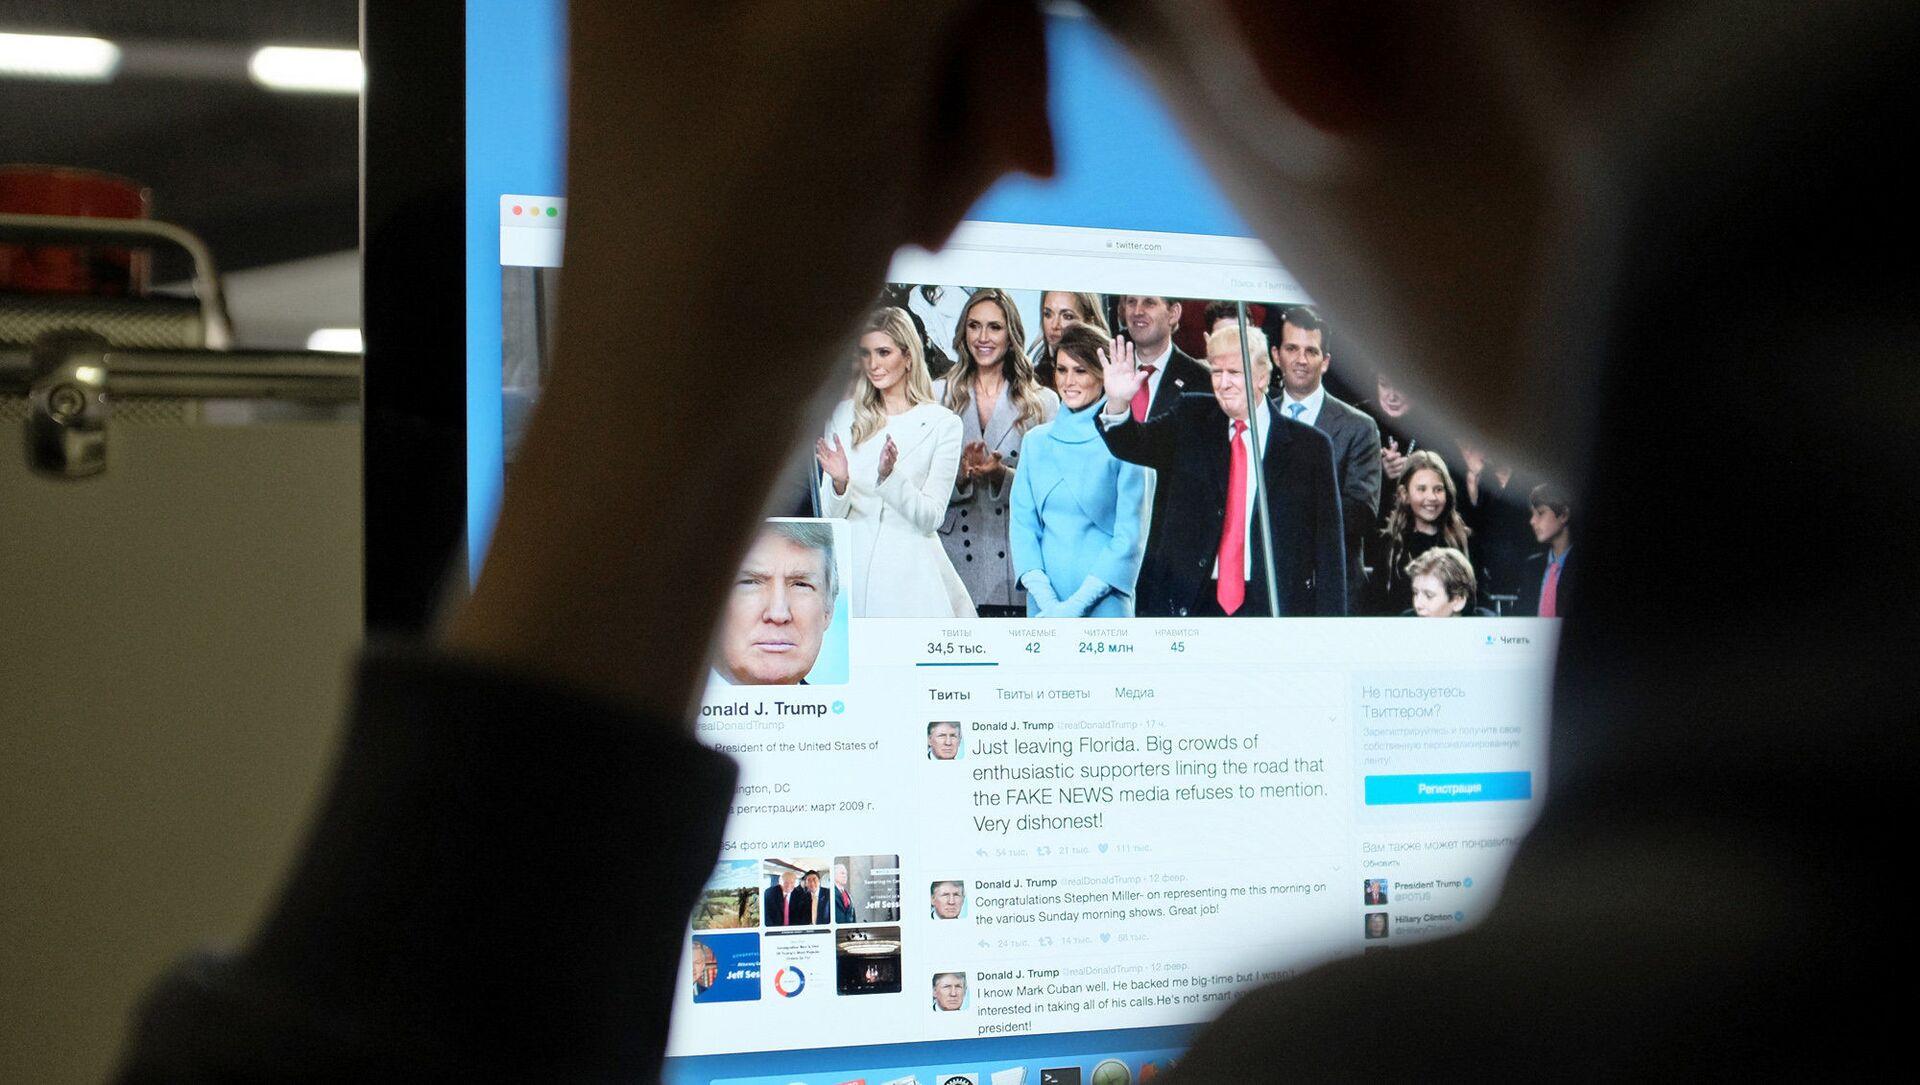 Strona Twittera prezydenta USA Donalda Trumpa na komputerze - Sputnik Polska, 1920, 10.02.2021